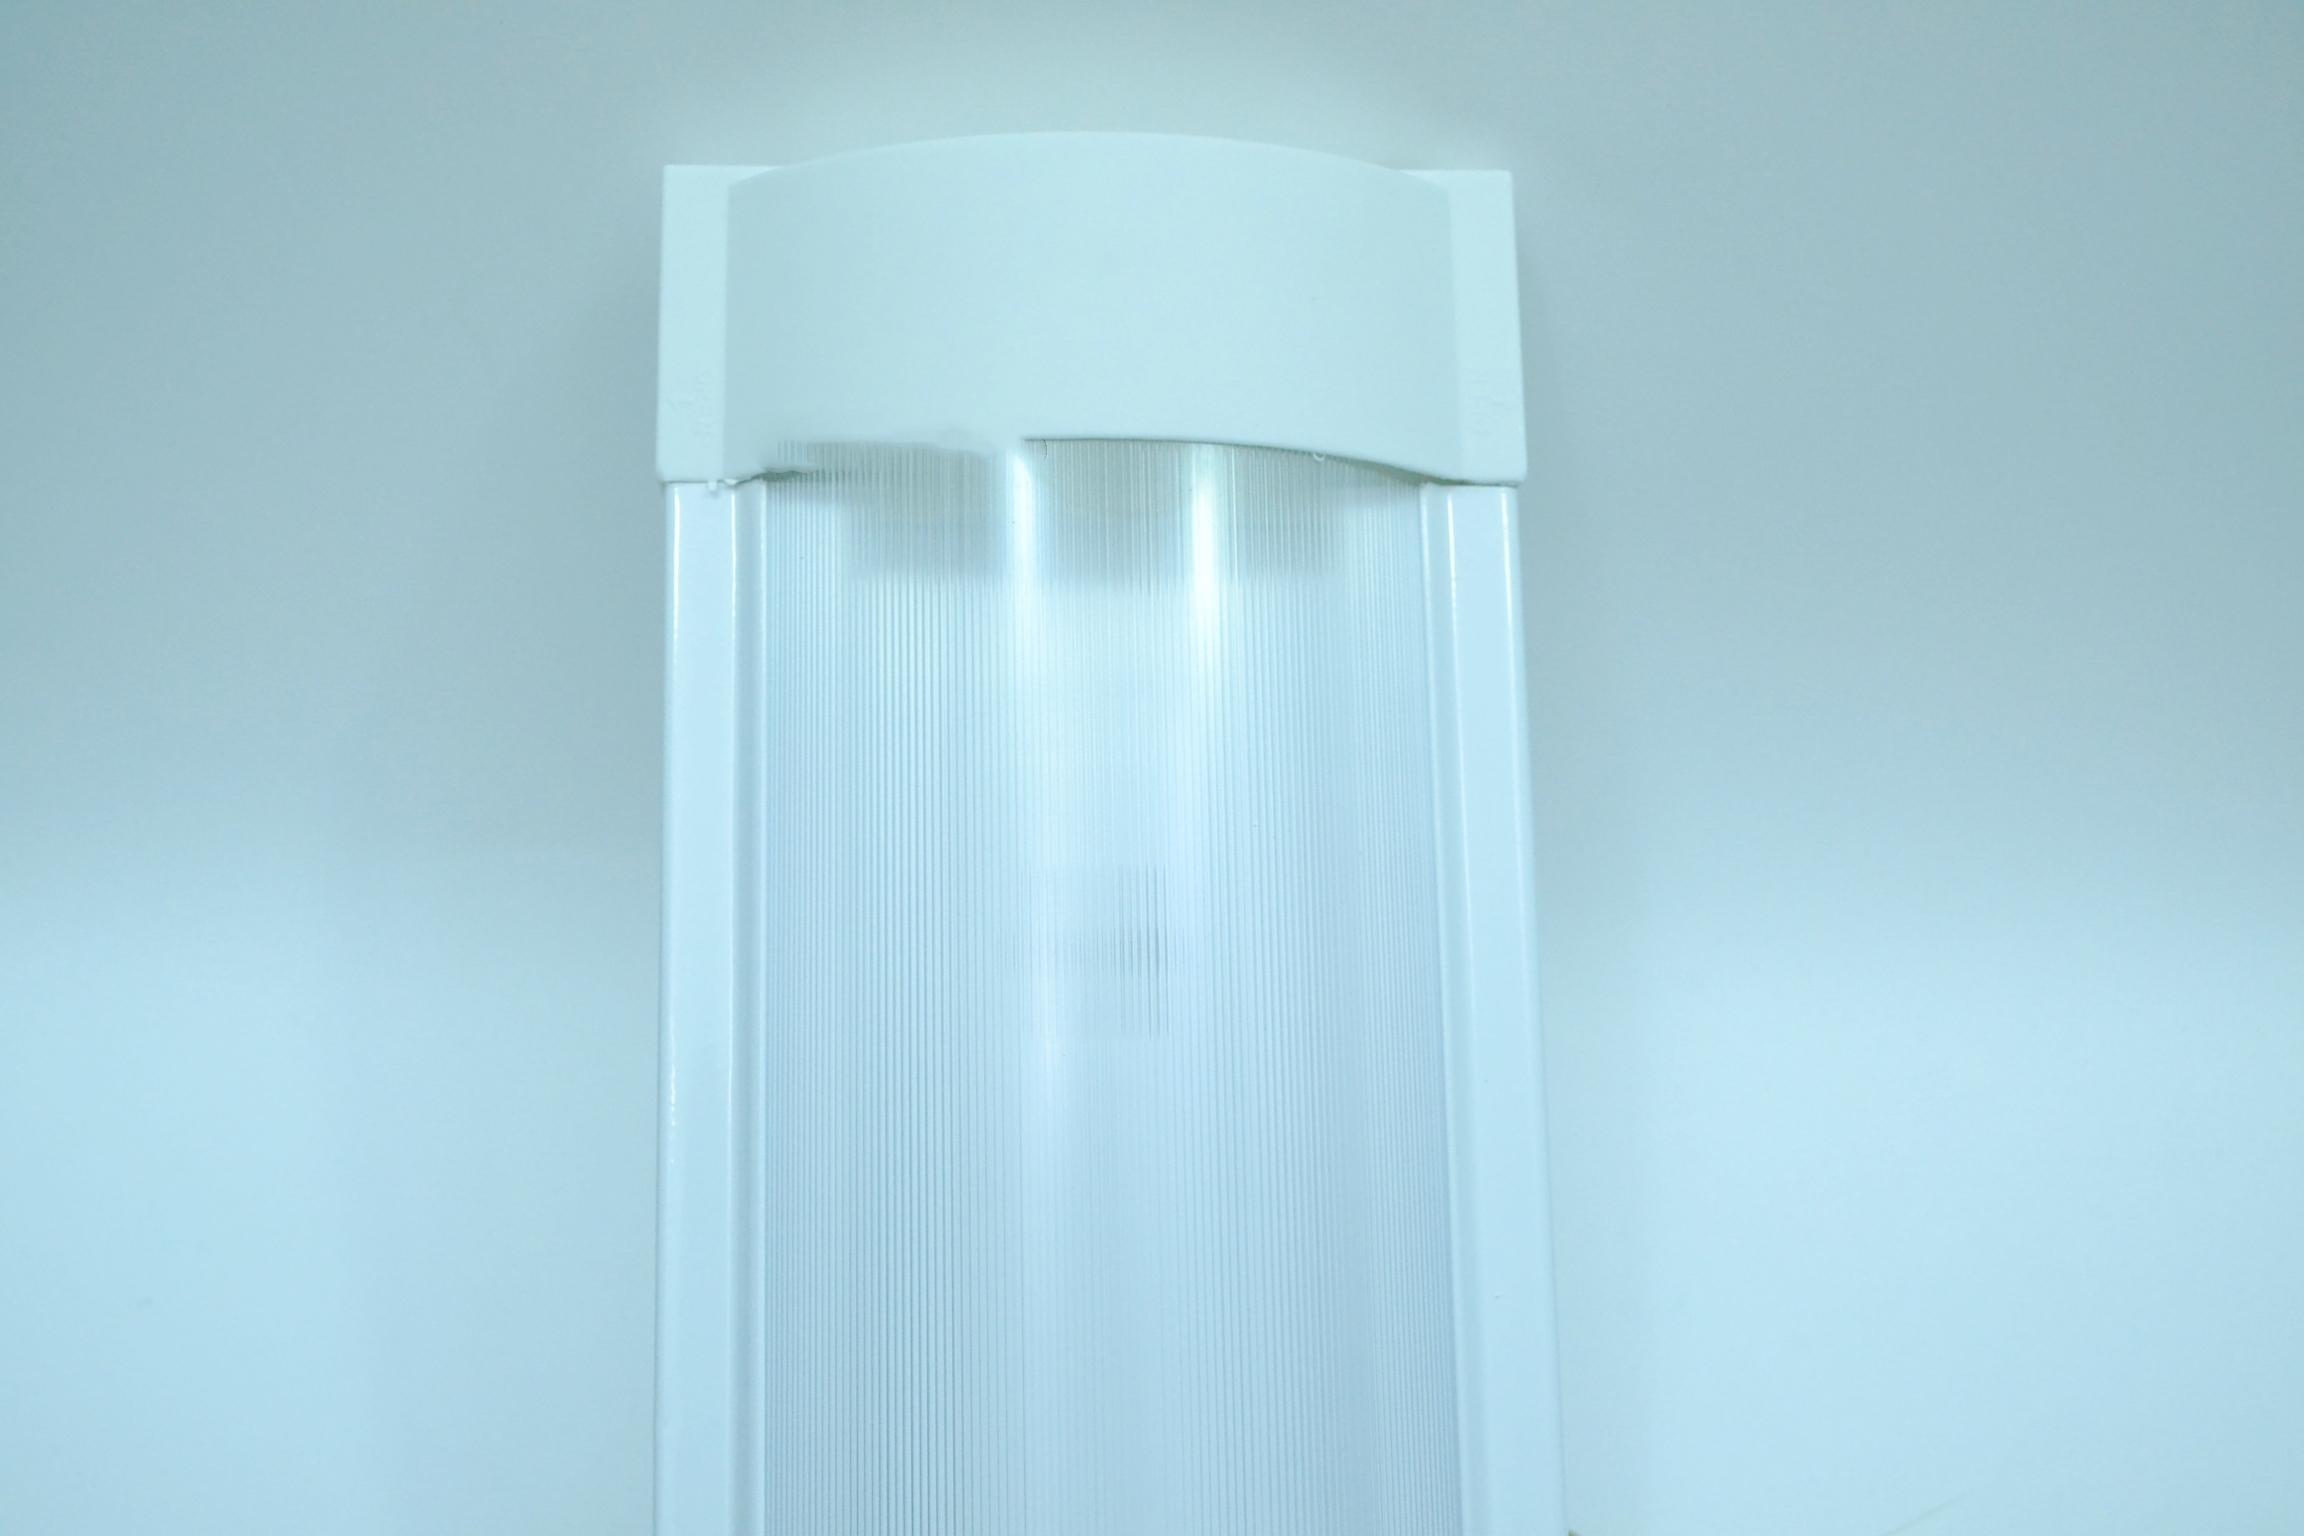 Plafoniera Led Soffitto Design : Mx b conx pz lampled offerte plafoniere pannelli led